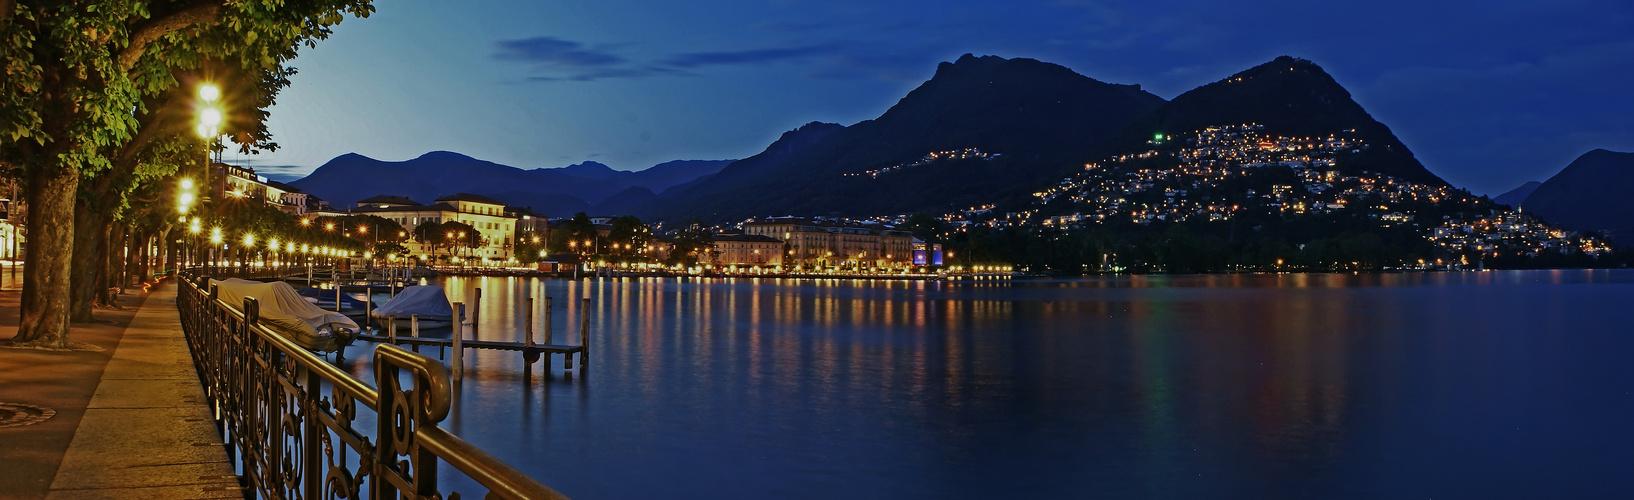 Lugano Seepromenade